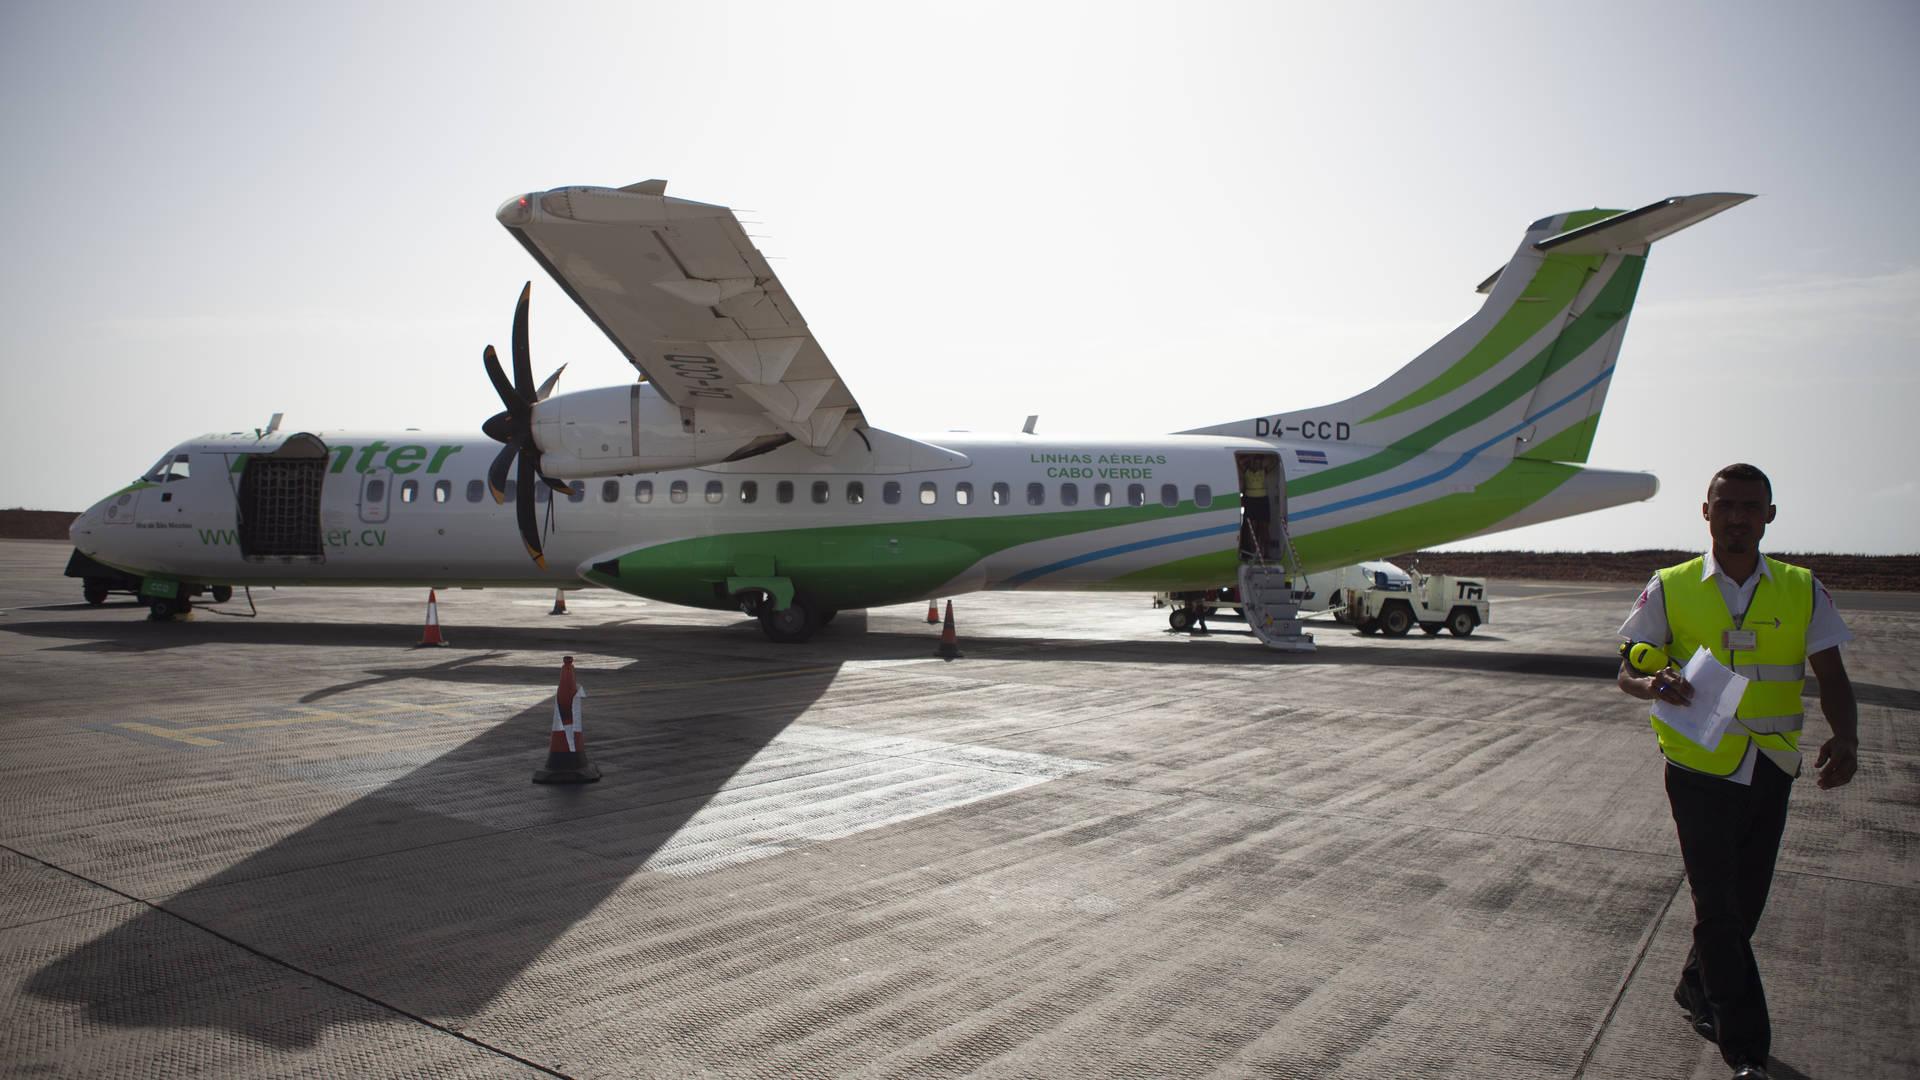 Binnenlandse vlucht met Binter - Vervoer in Kaapverdië